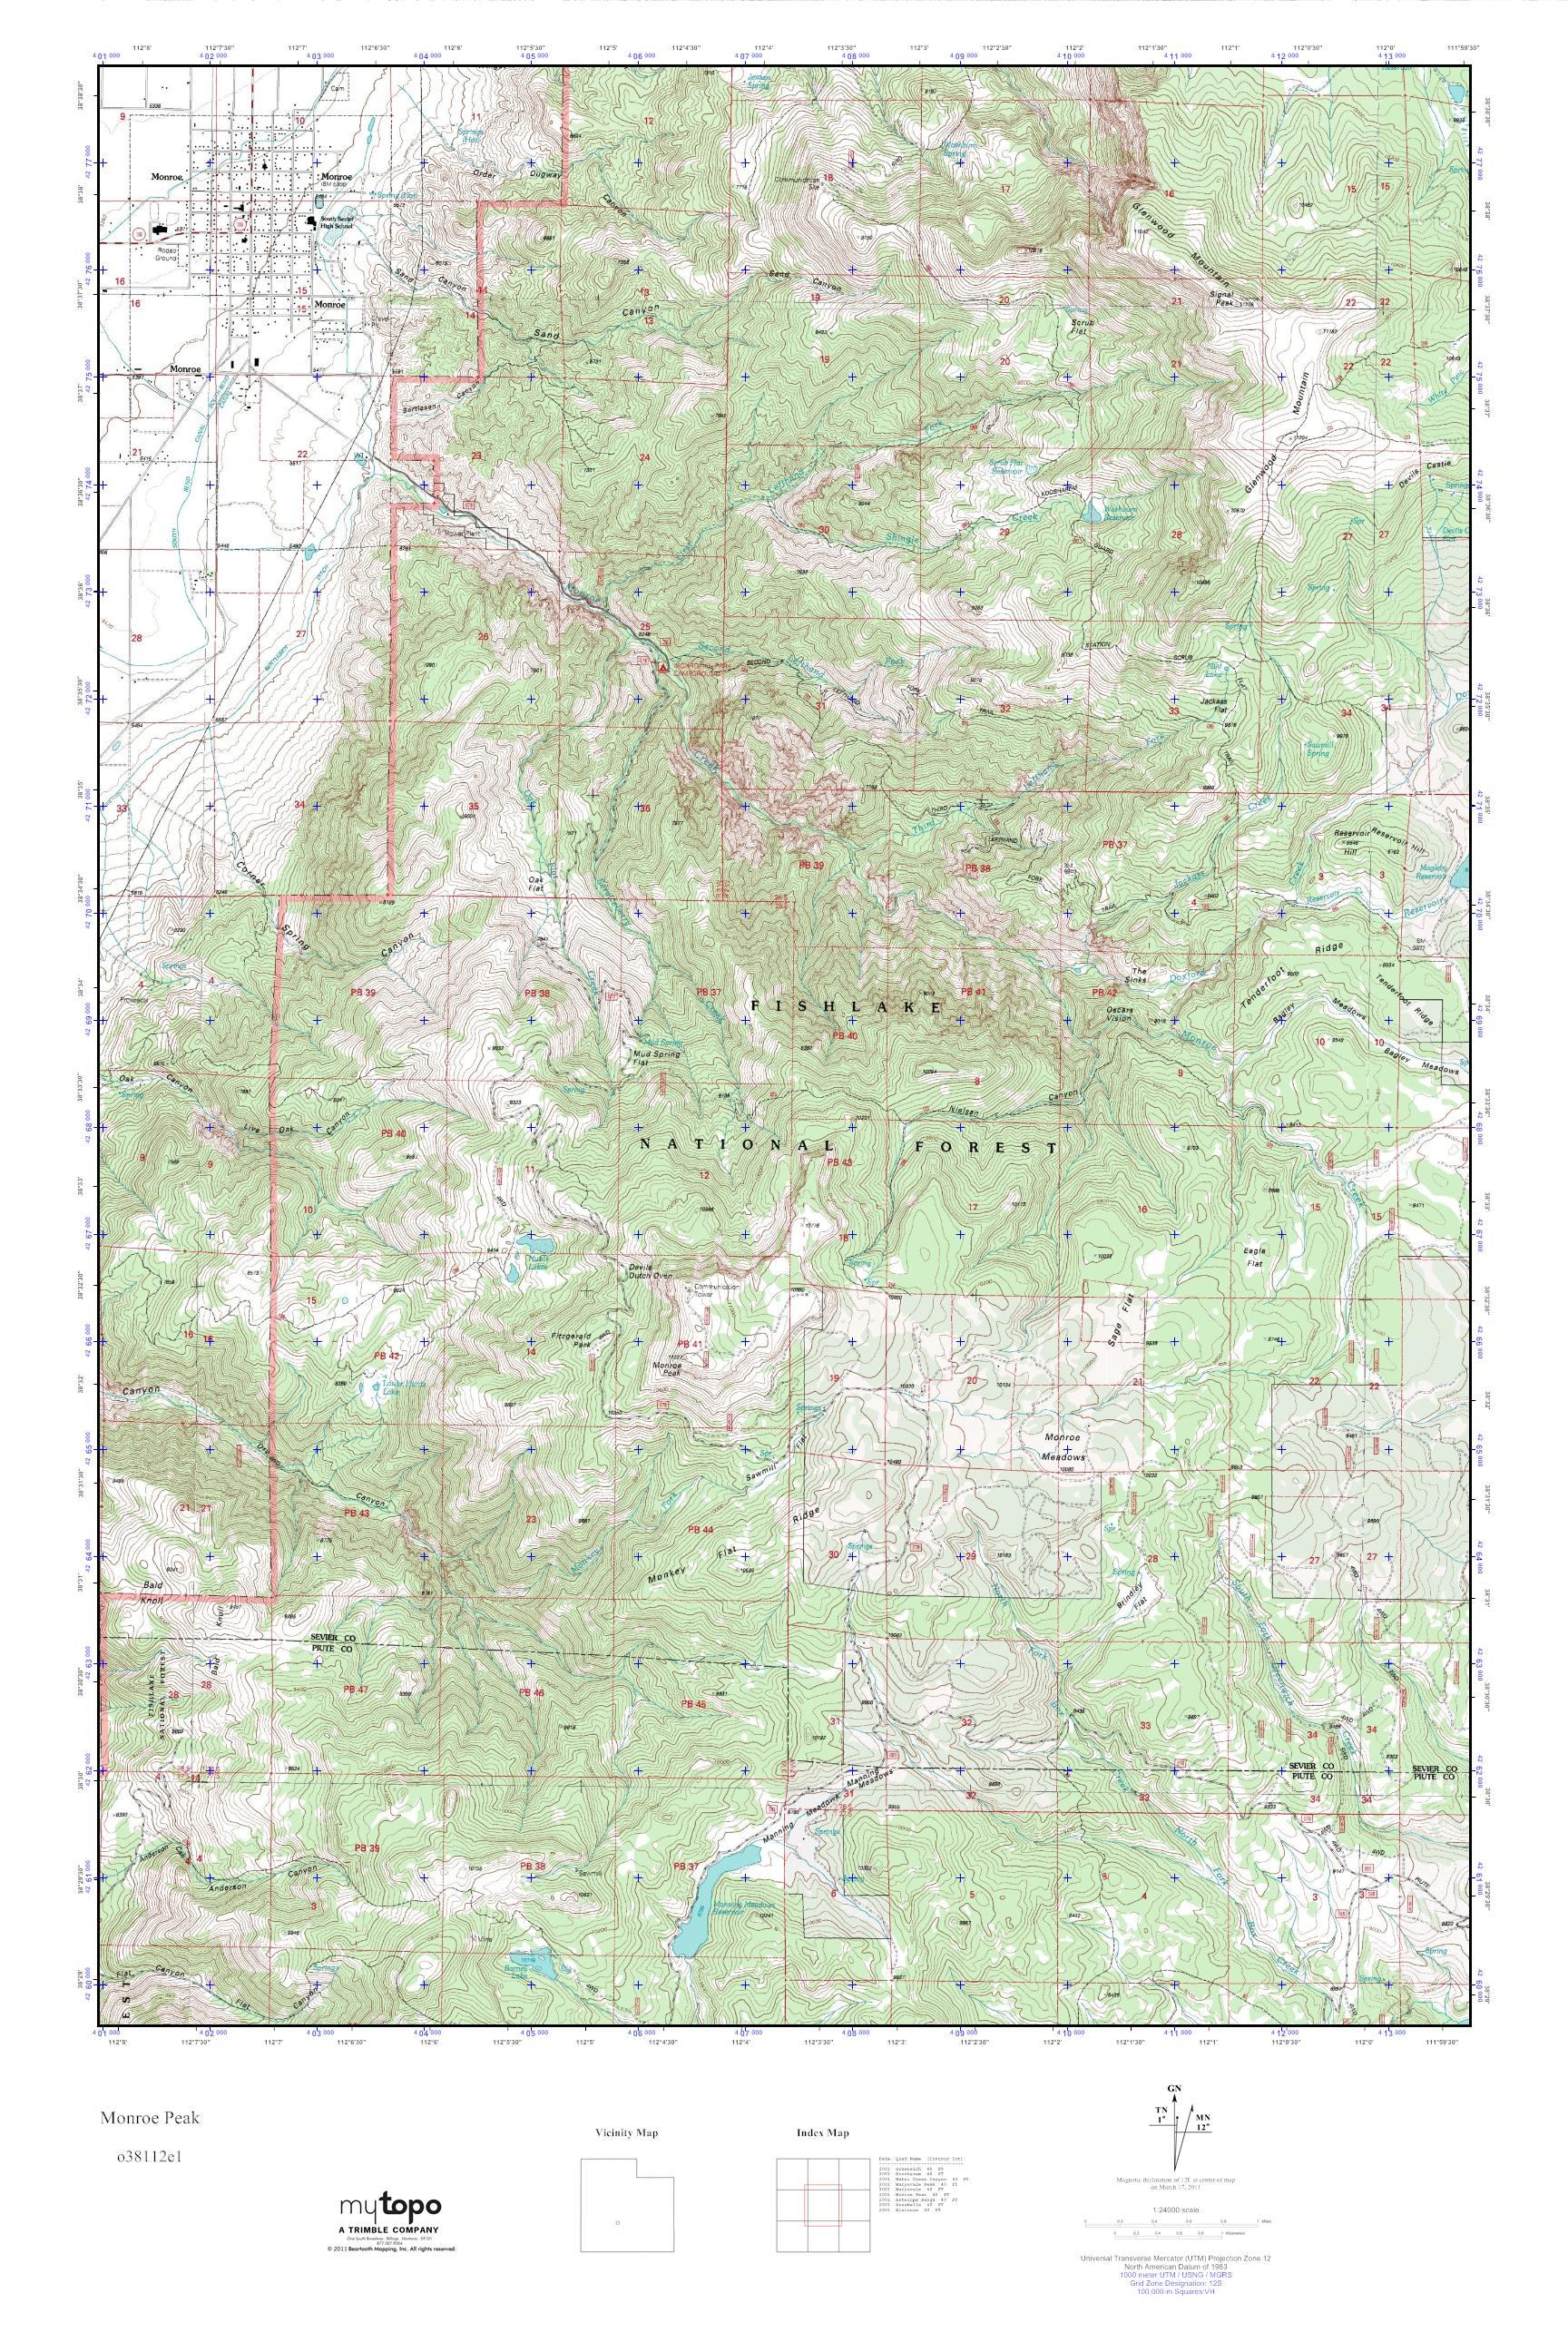 Mytopo Monroe Peak Utah Usgs Quad Topo Map